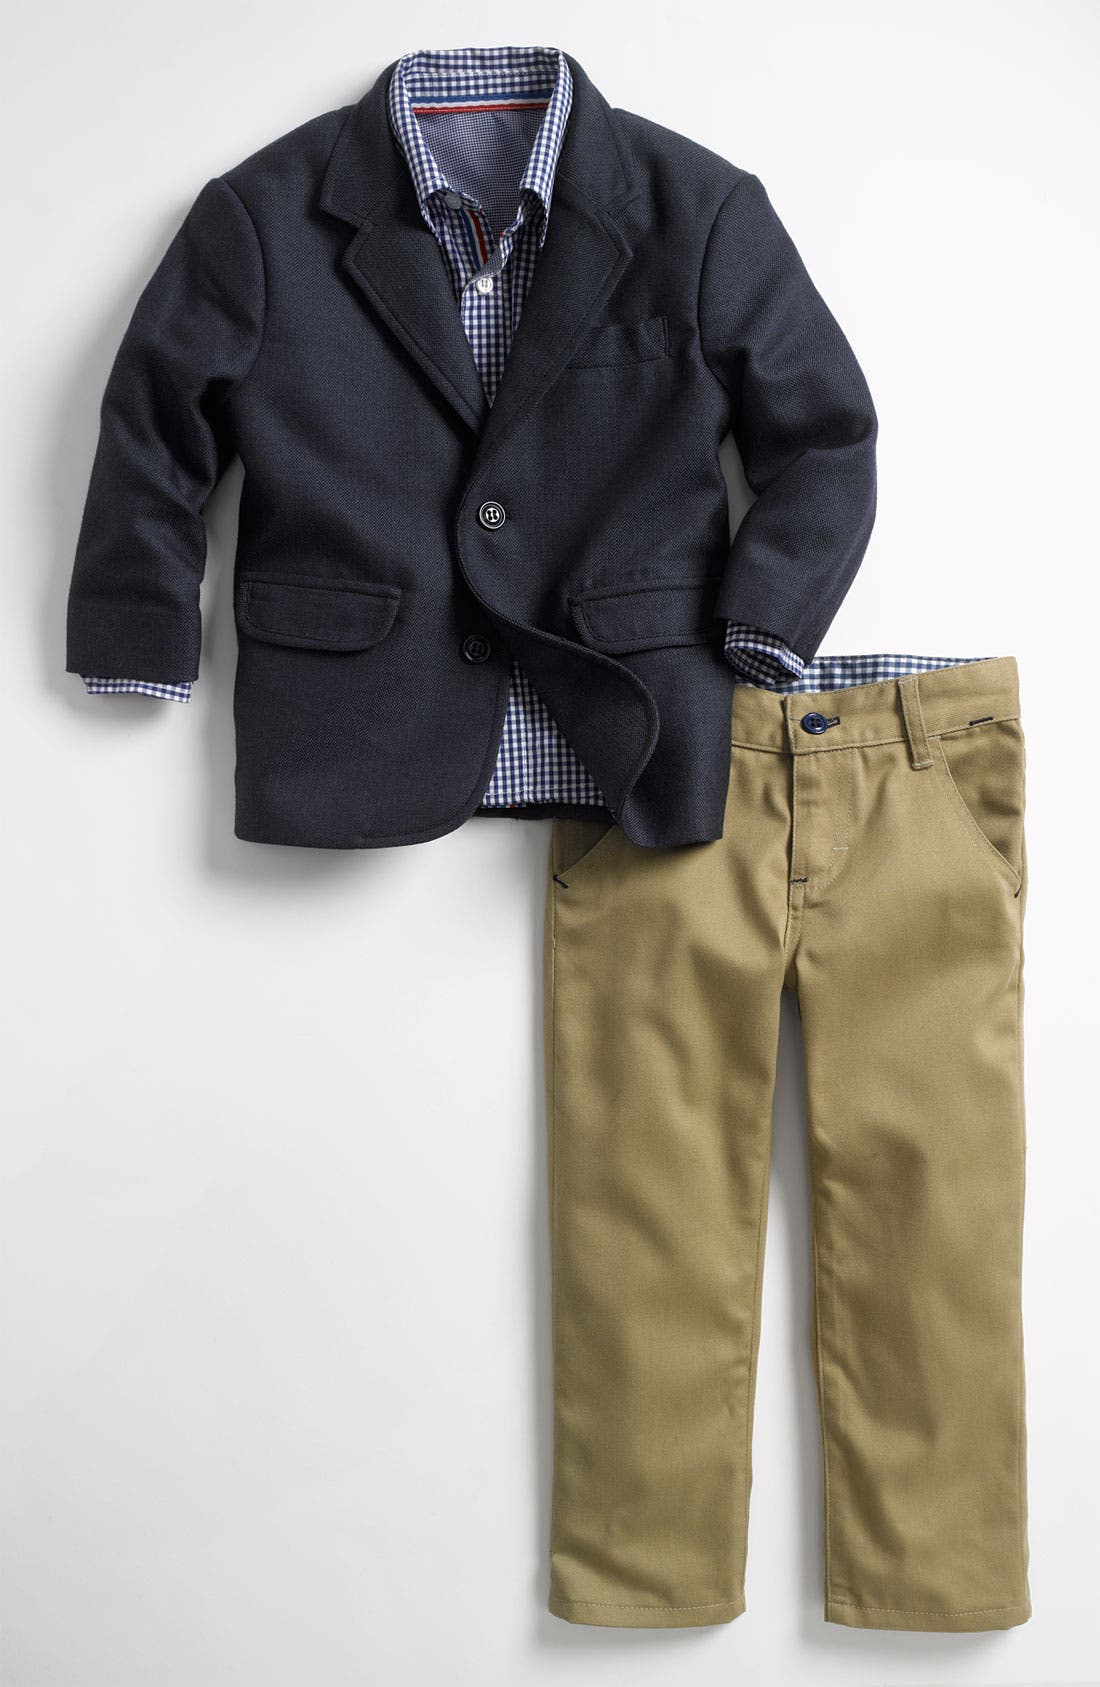 Main Image - Sovereign Code 'United' Blazer, Shirt & Pants Set (Toddler)